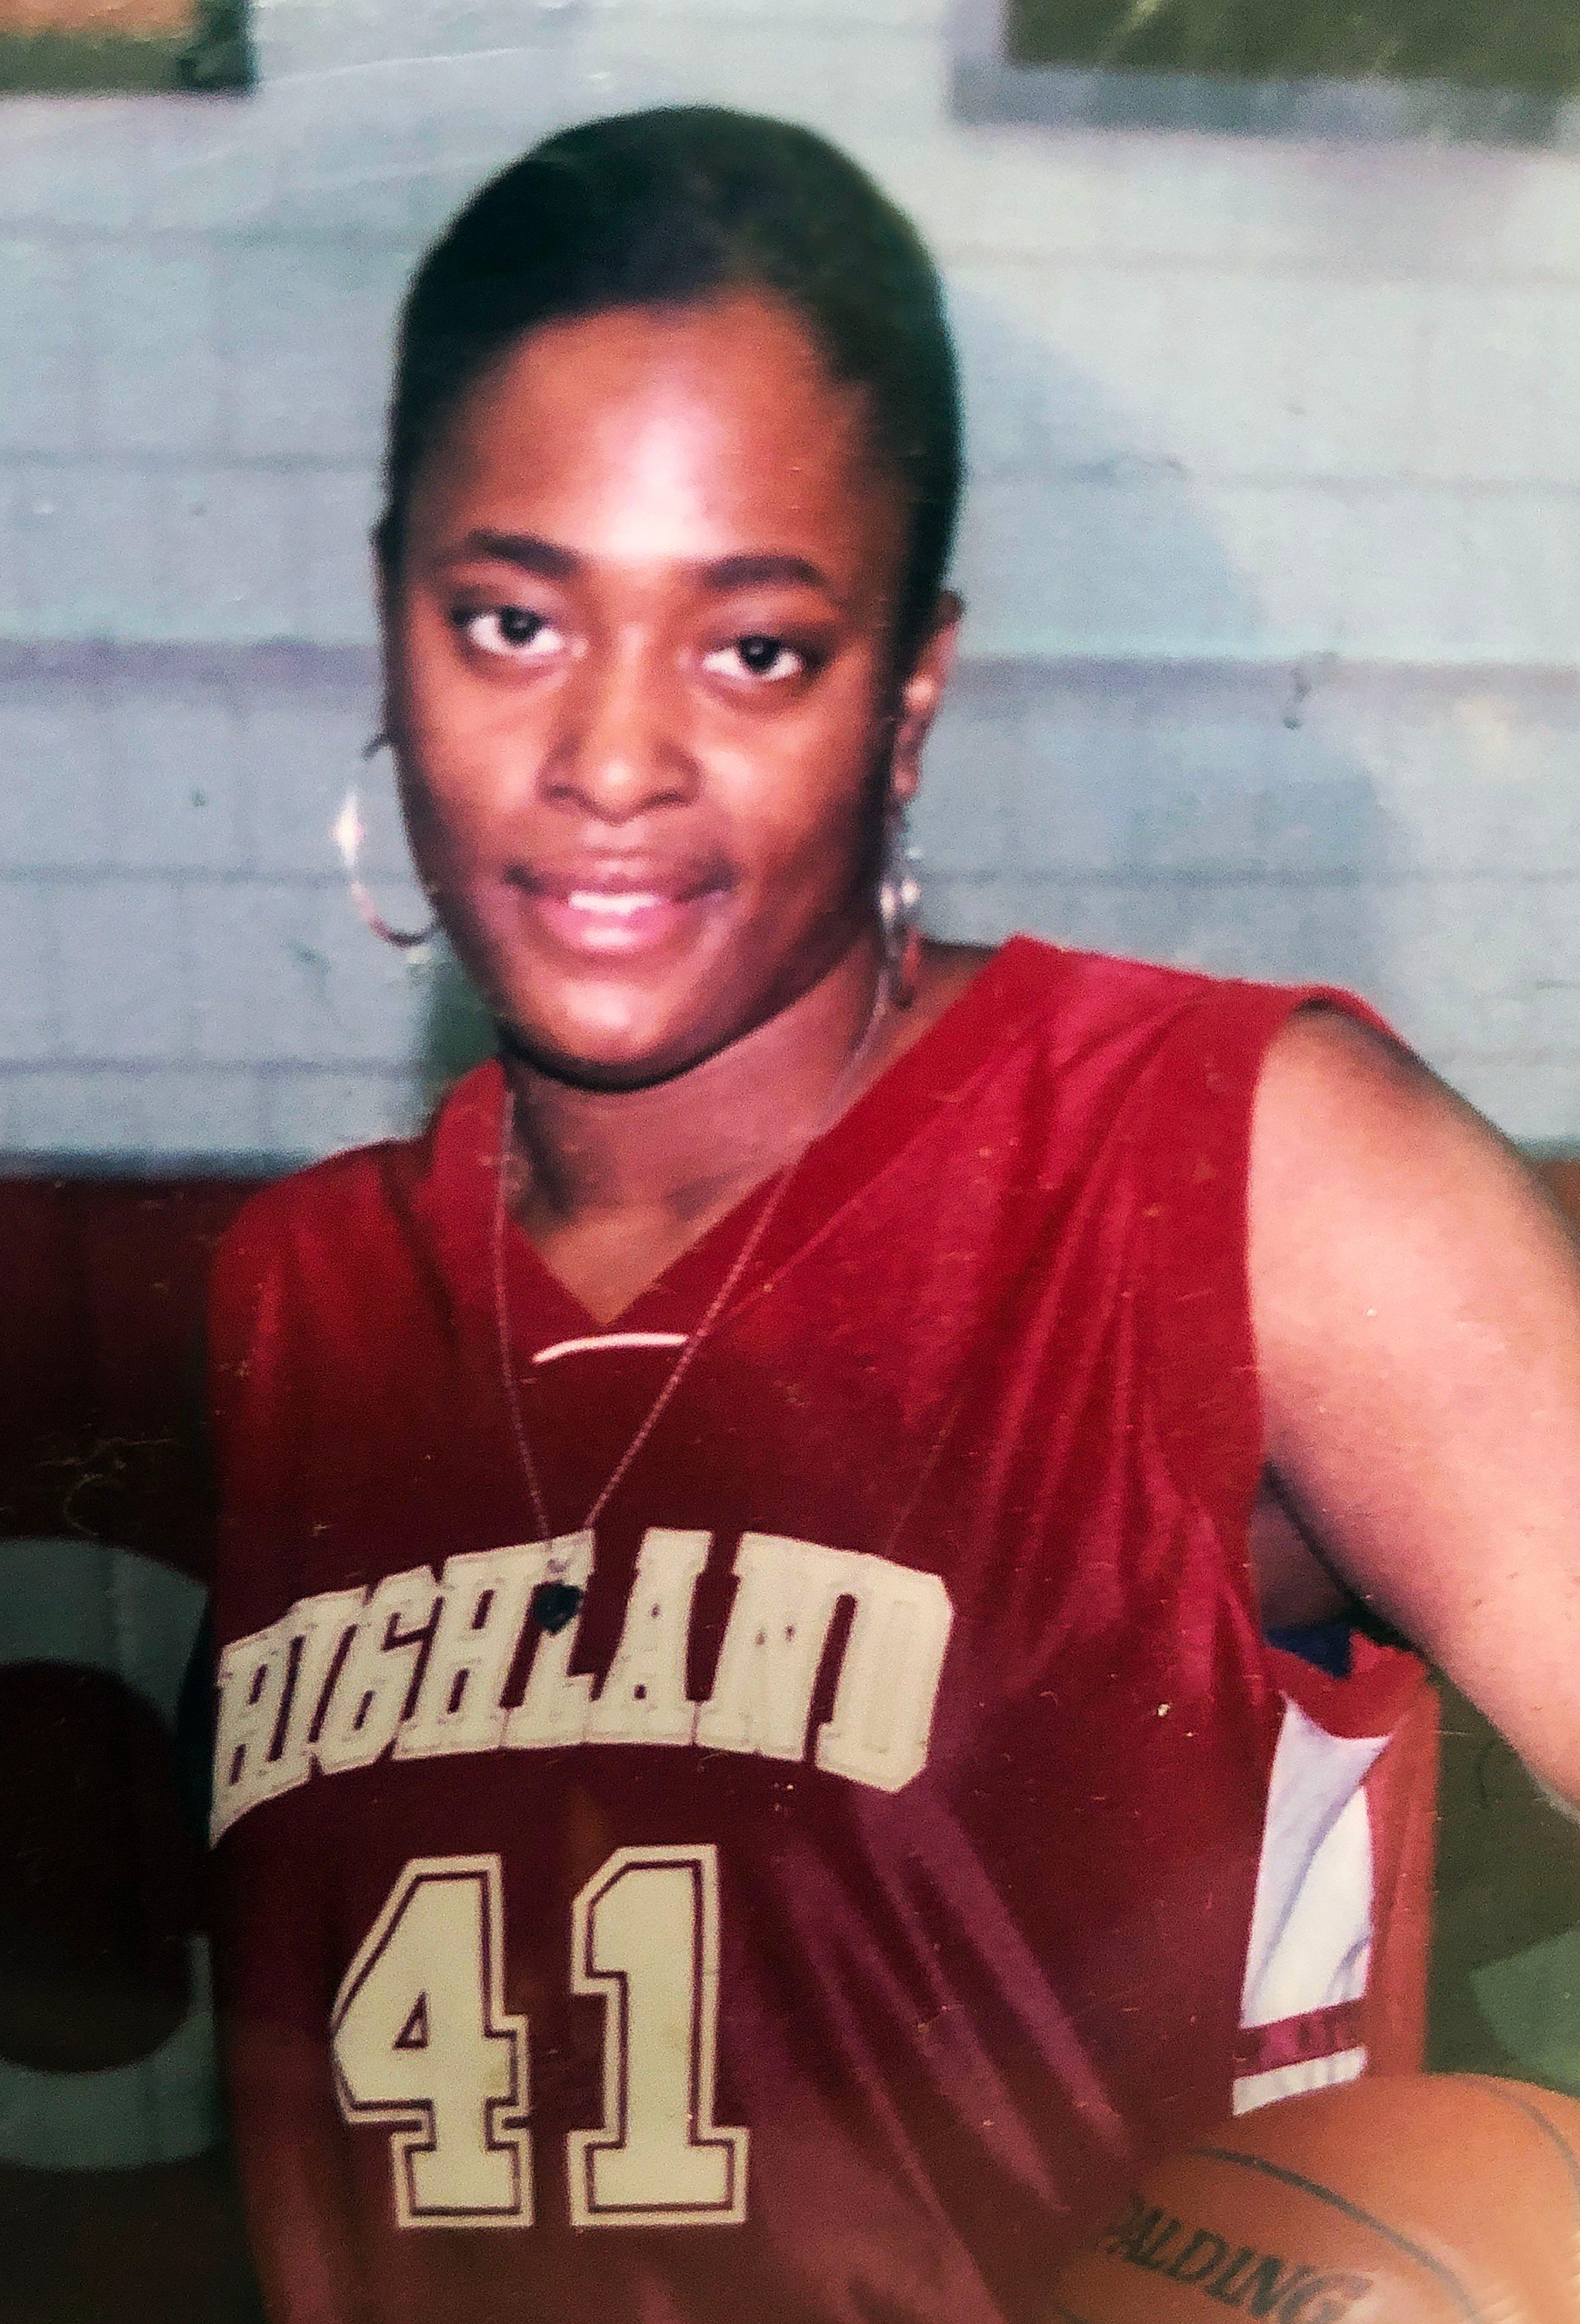 LaVera Jeffrie, 2004 senior photo from Highland Park High School in St. Paul.